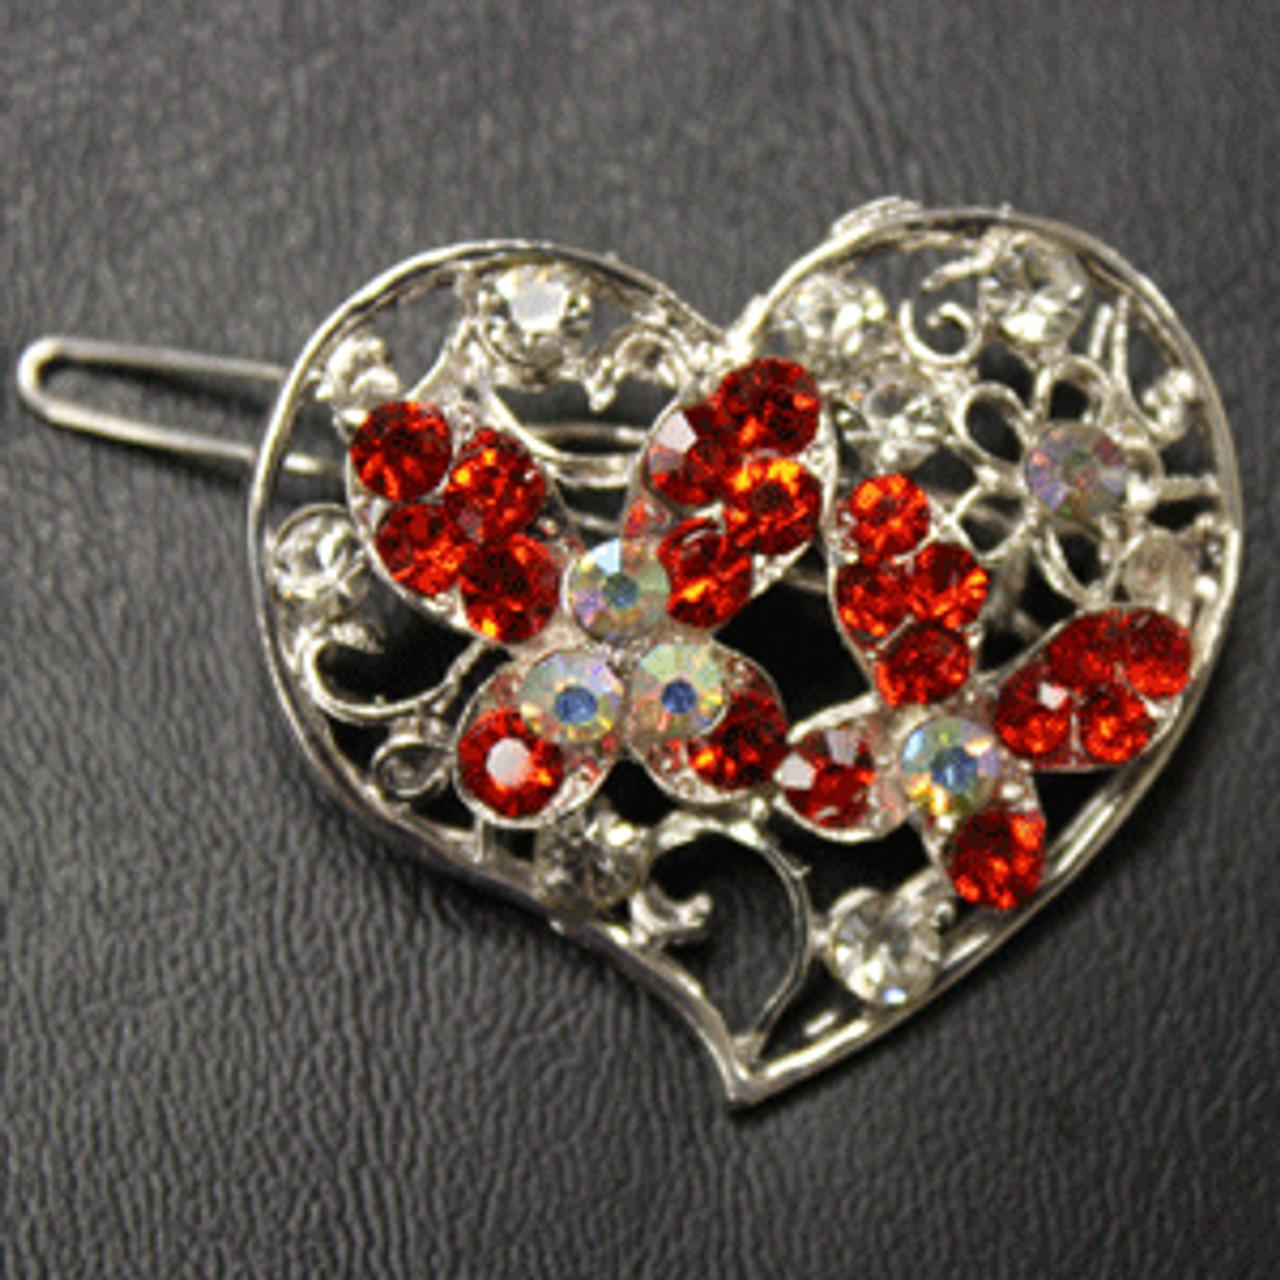 Red heart barrette